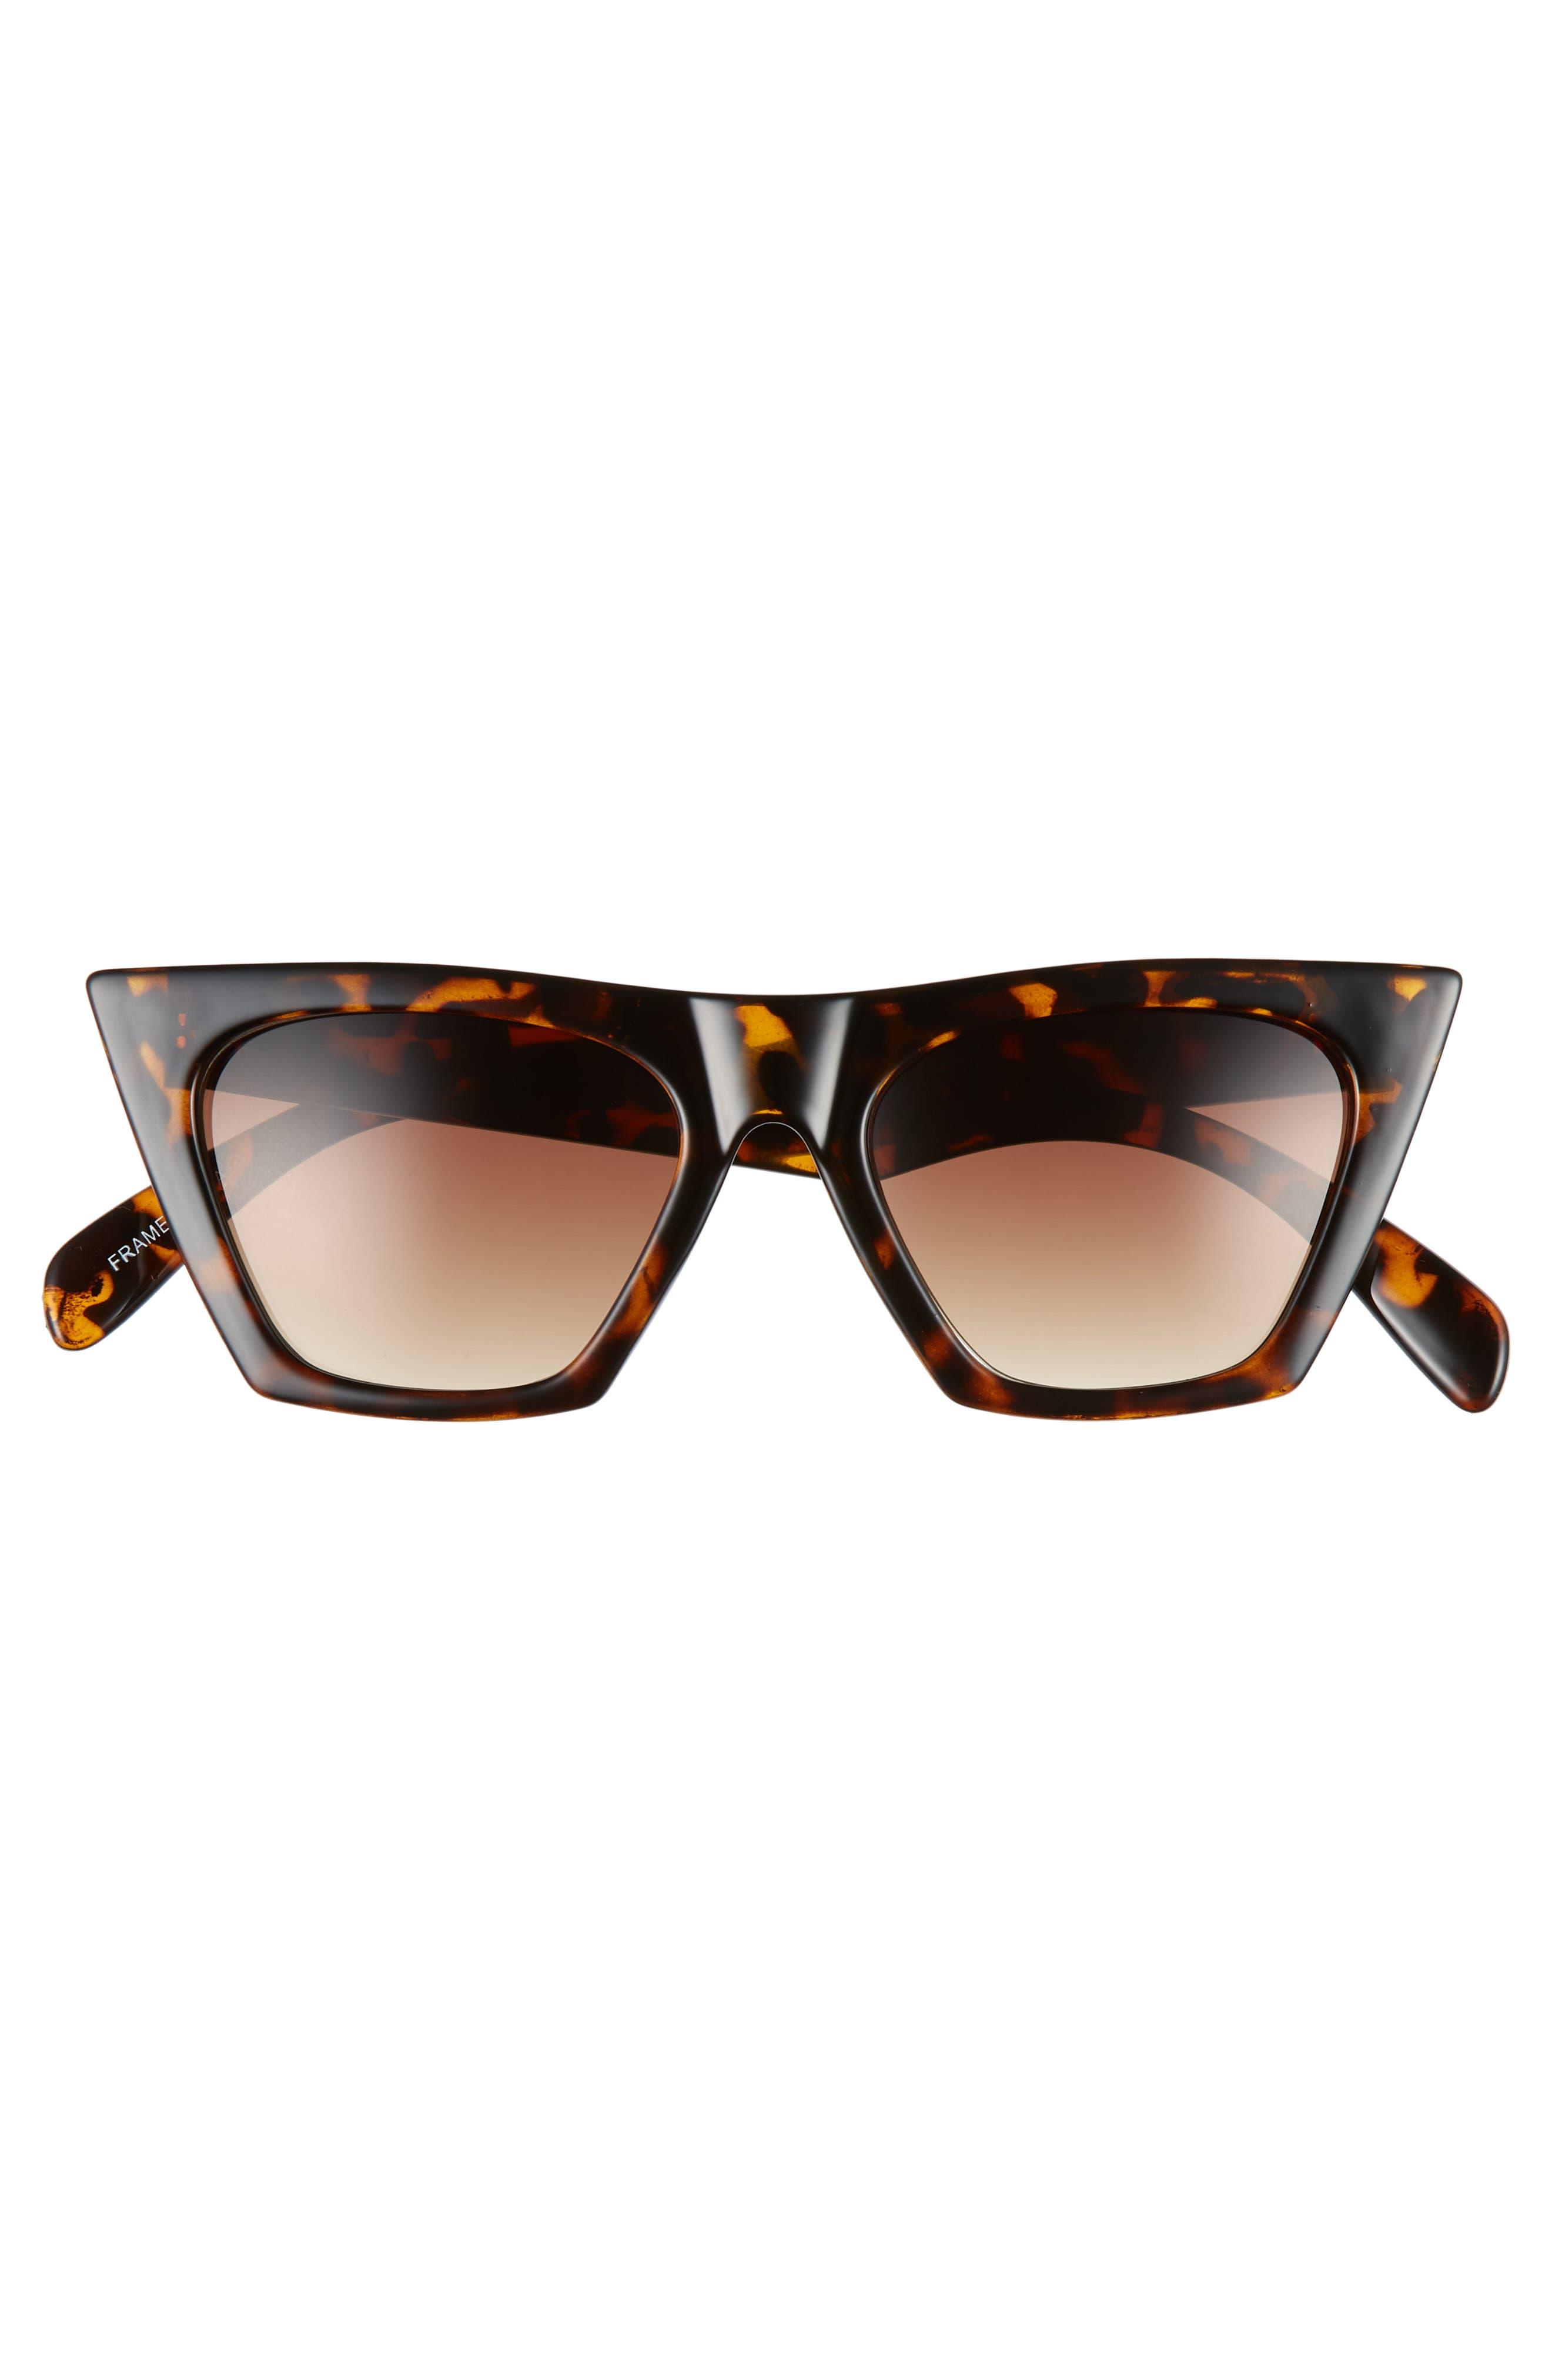 50mm Square Cat Eye Sunglasses,                             Alternate thumbnail 3, color,                             TORTOISE